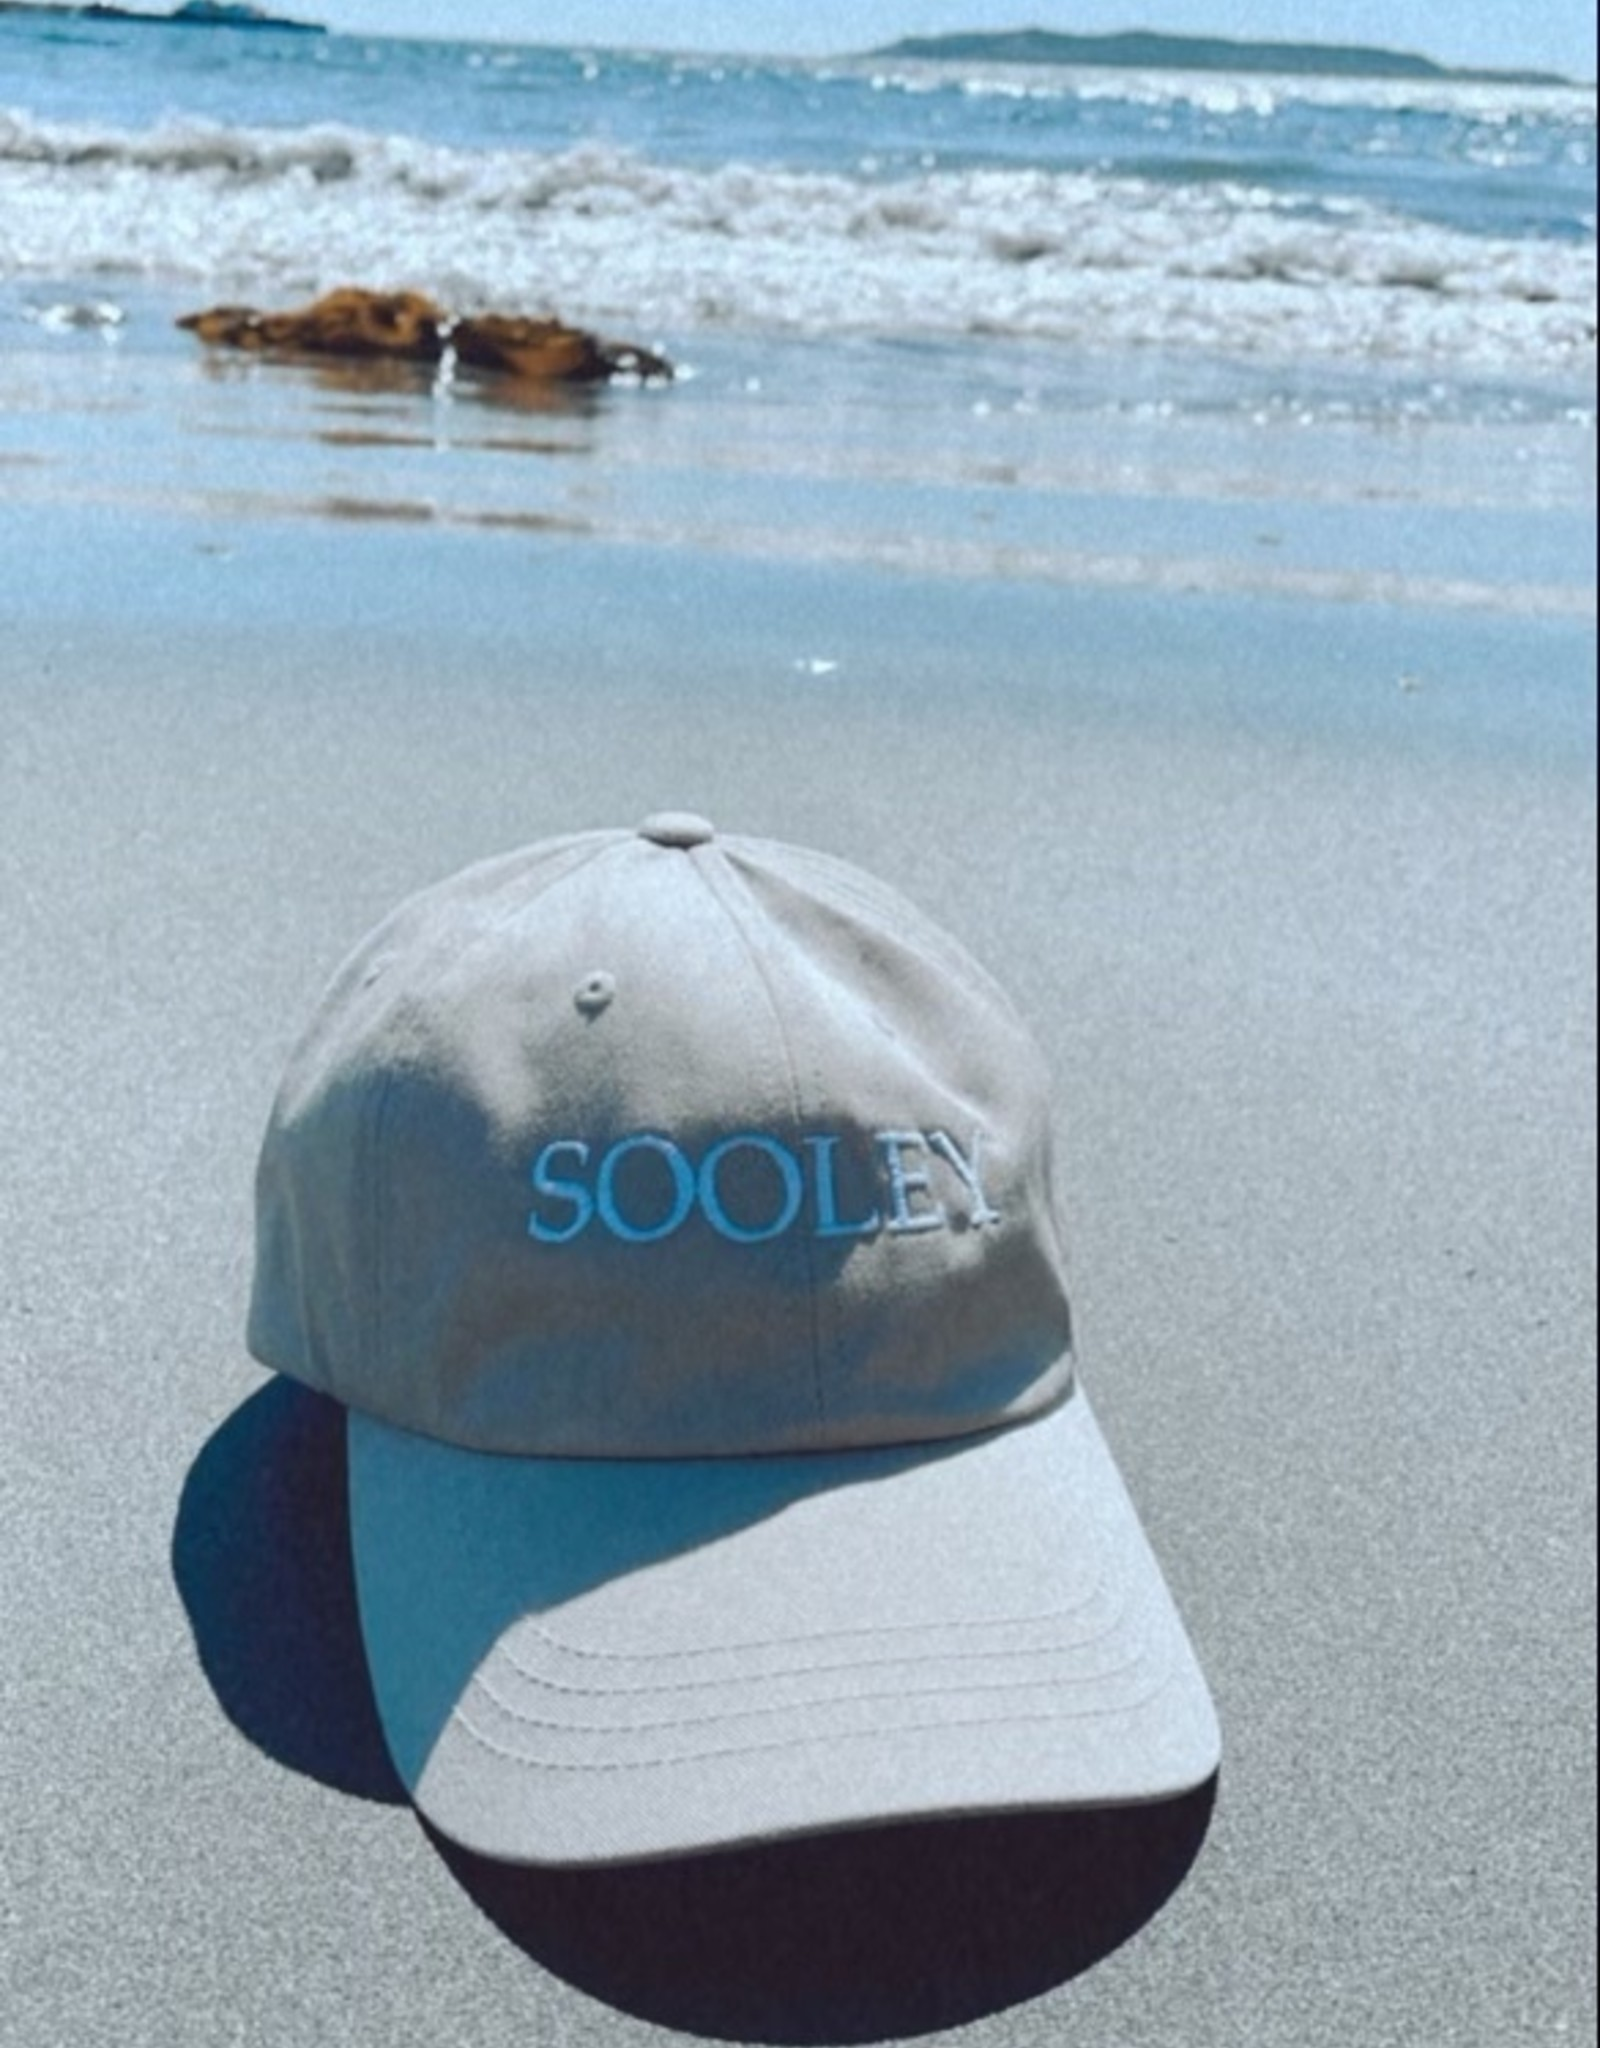 Sooley Embroidered Baseball Hat